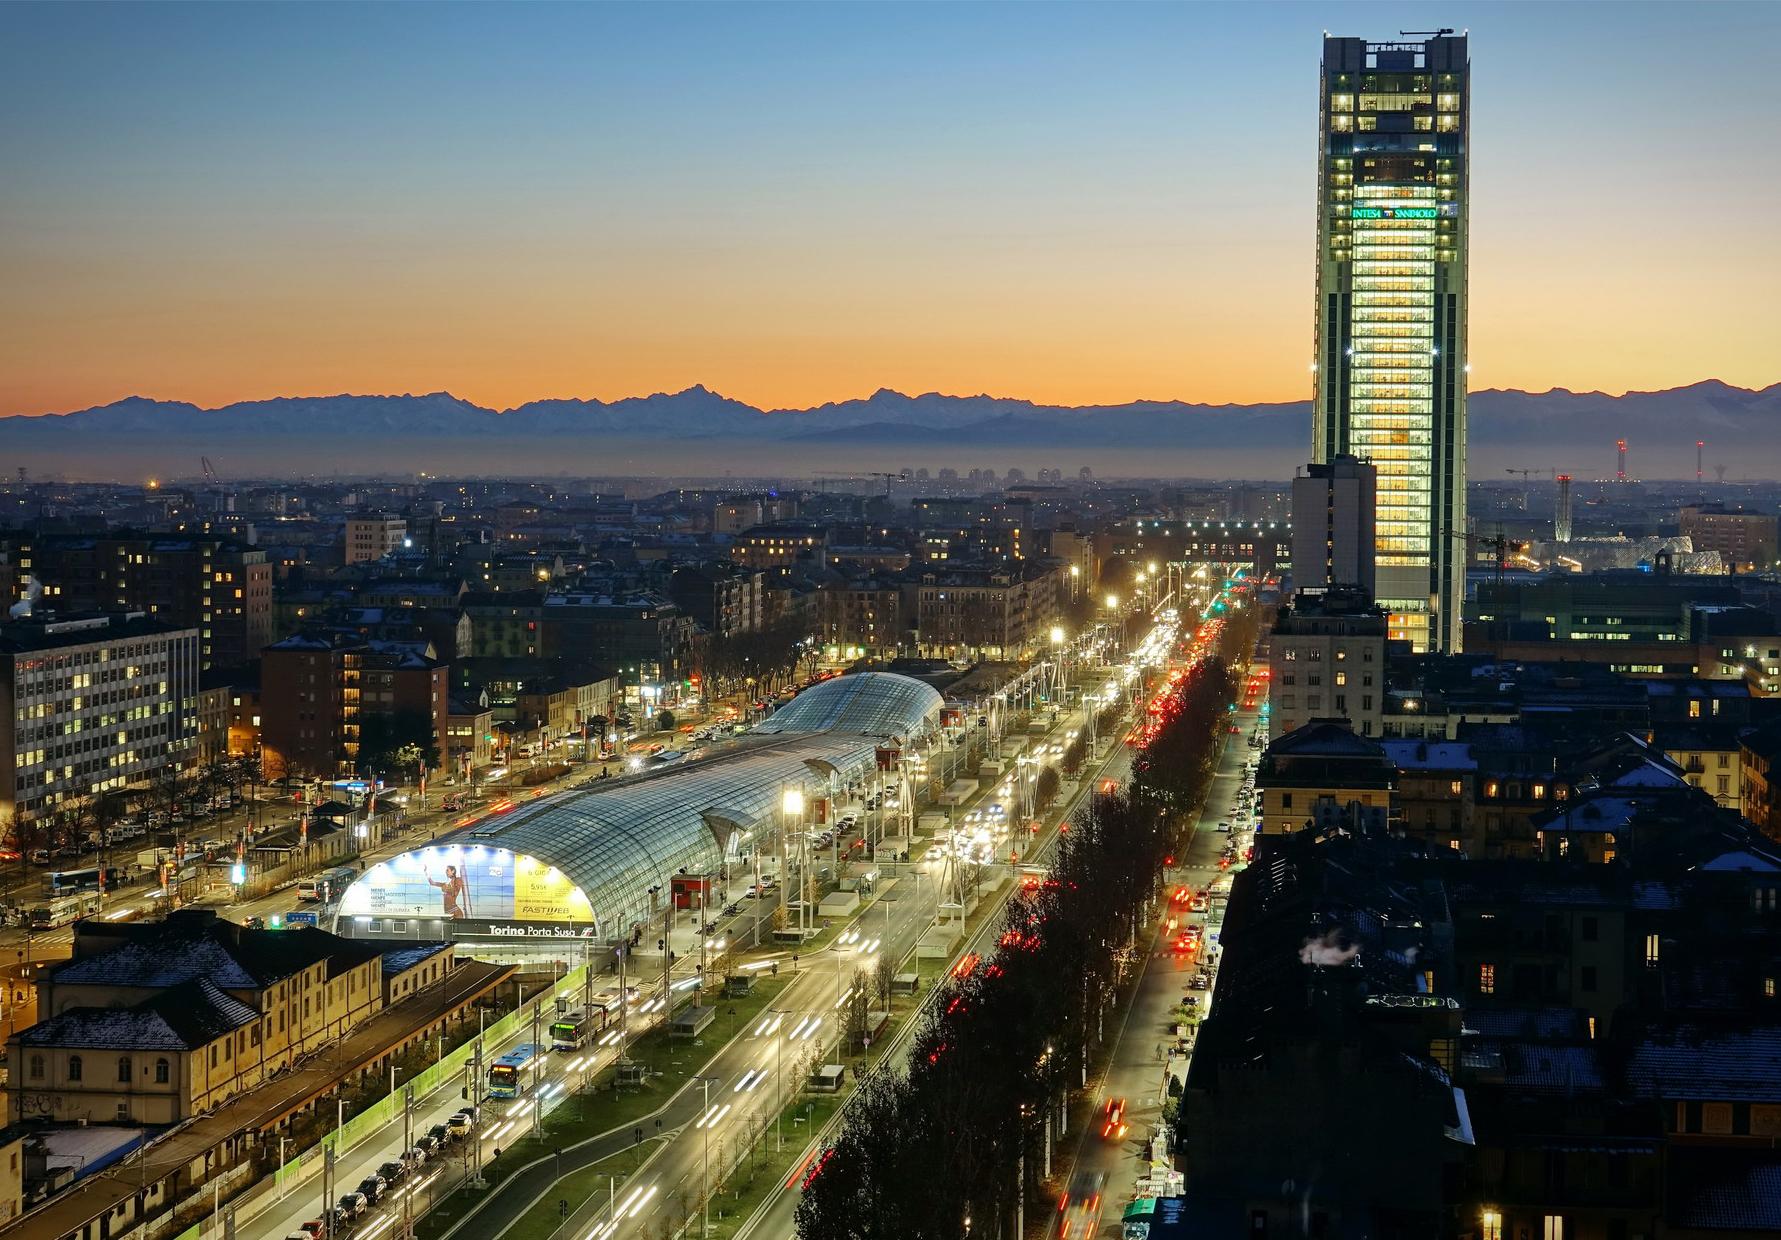 grattacielo-intesasanpaolo-0009-no-cornice